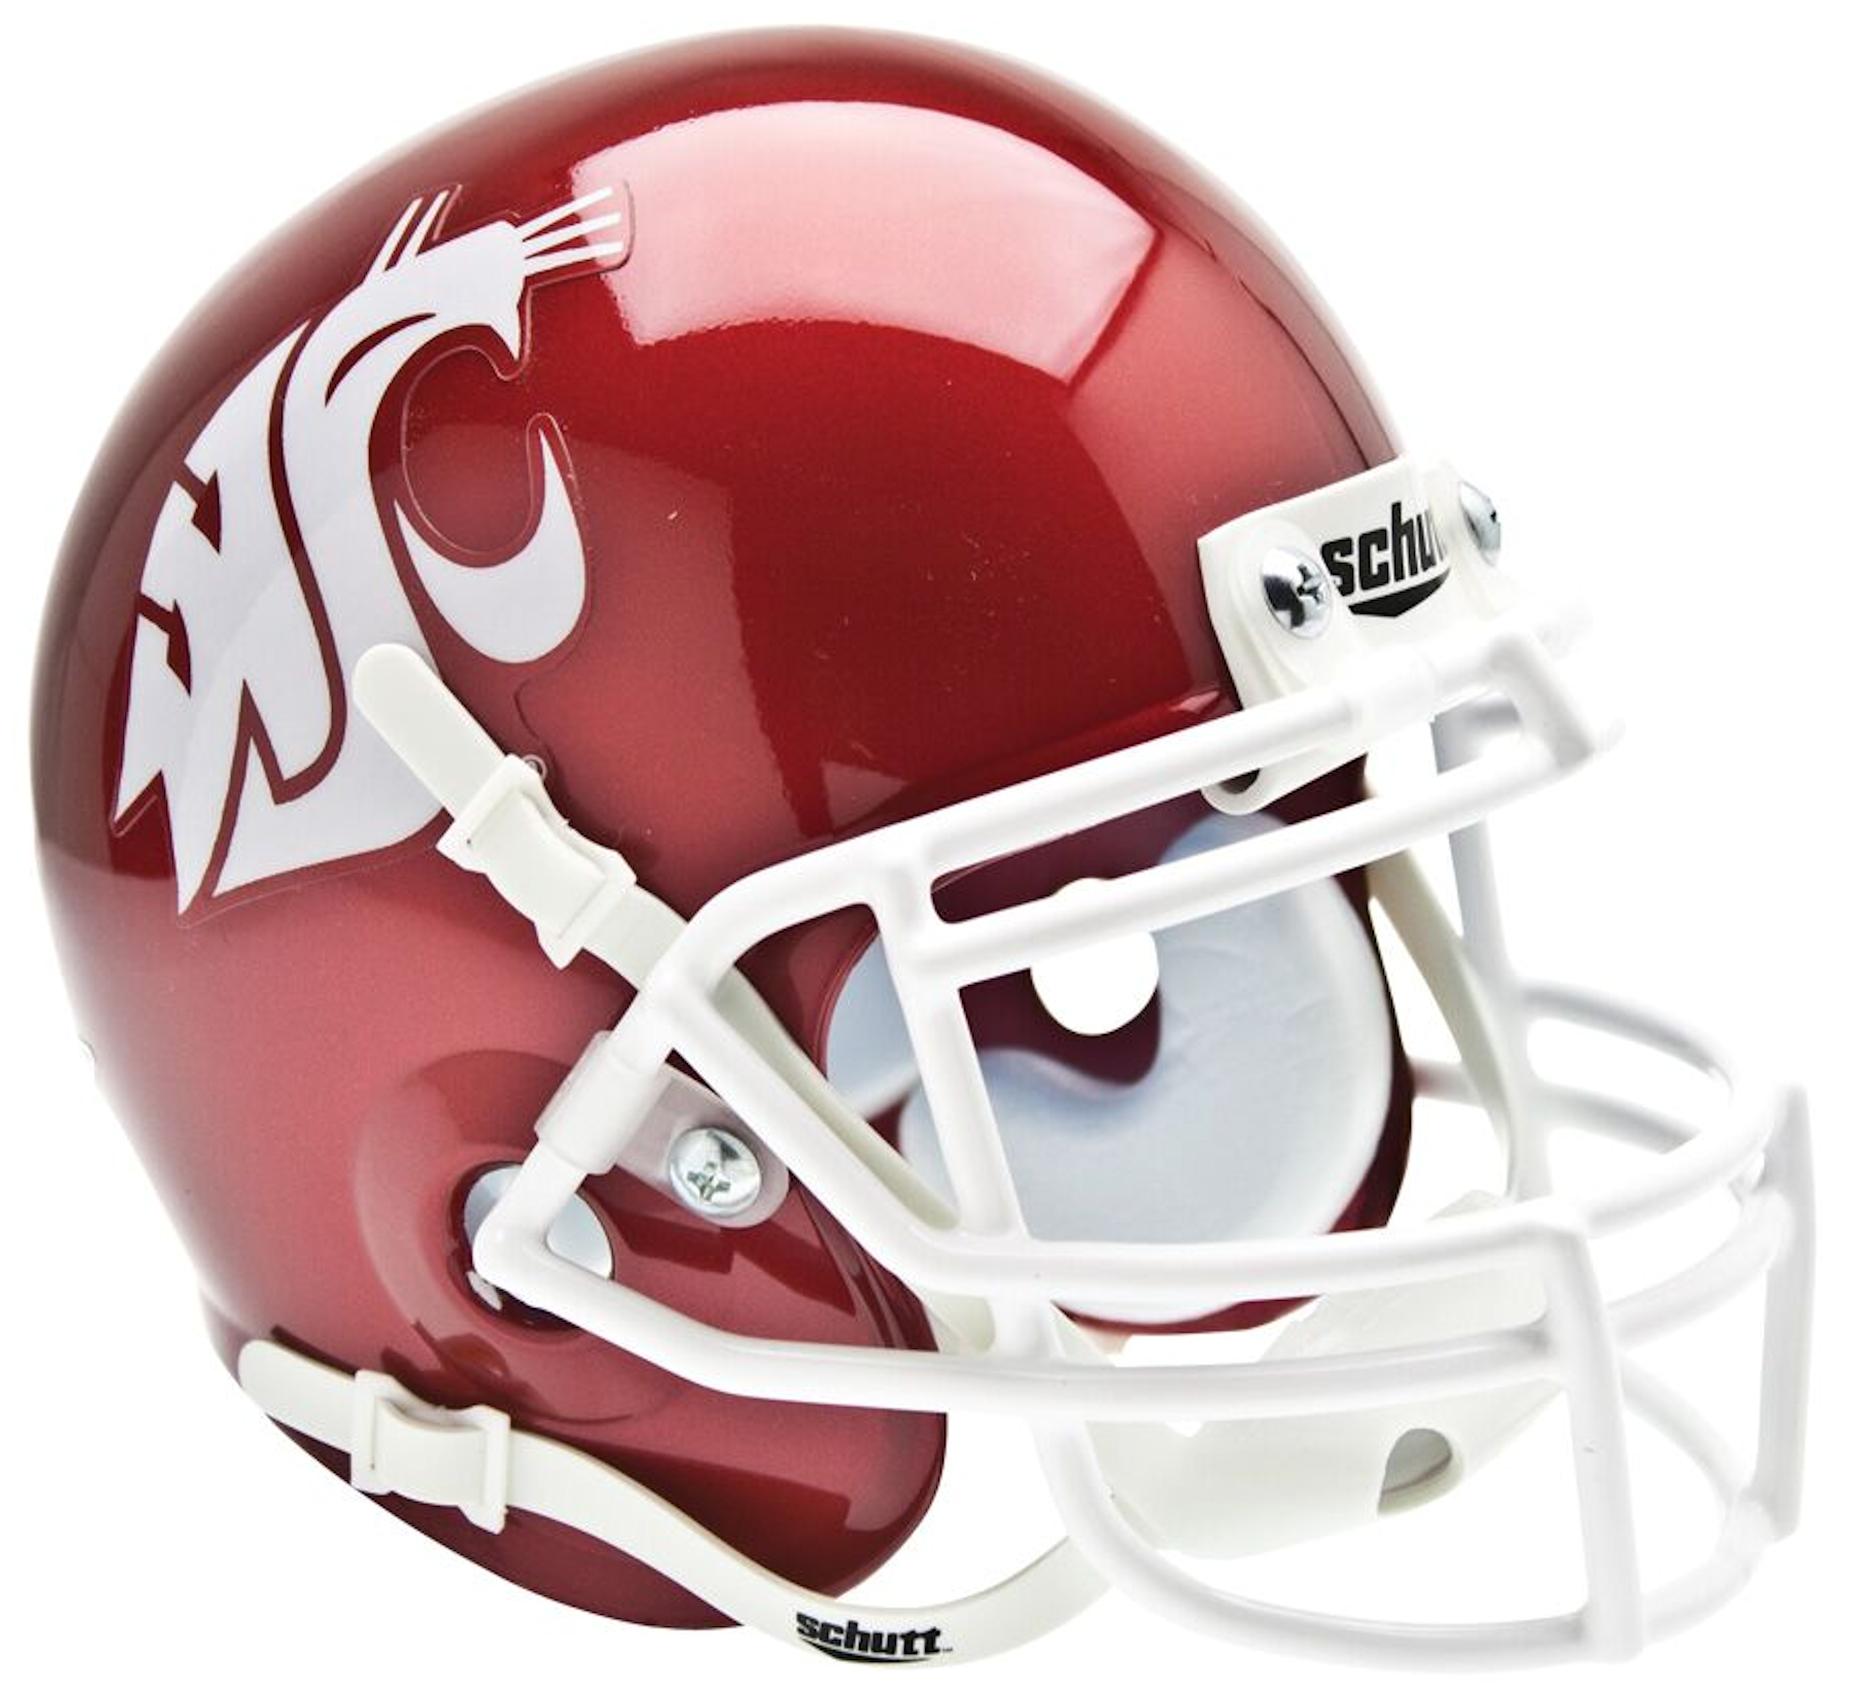 Washington State Cougars Mini XP Authentic Helmet Schutt <B>Scarlet</B>